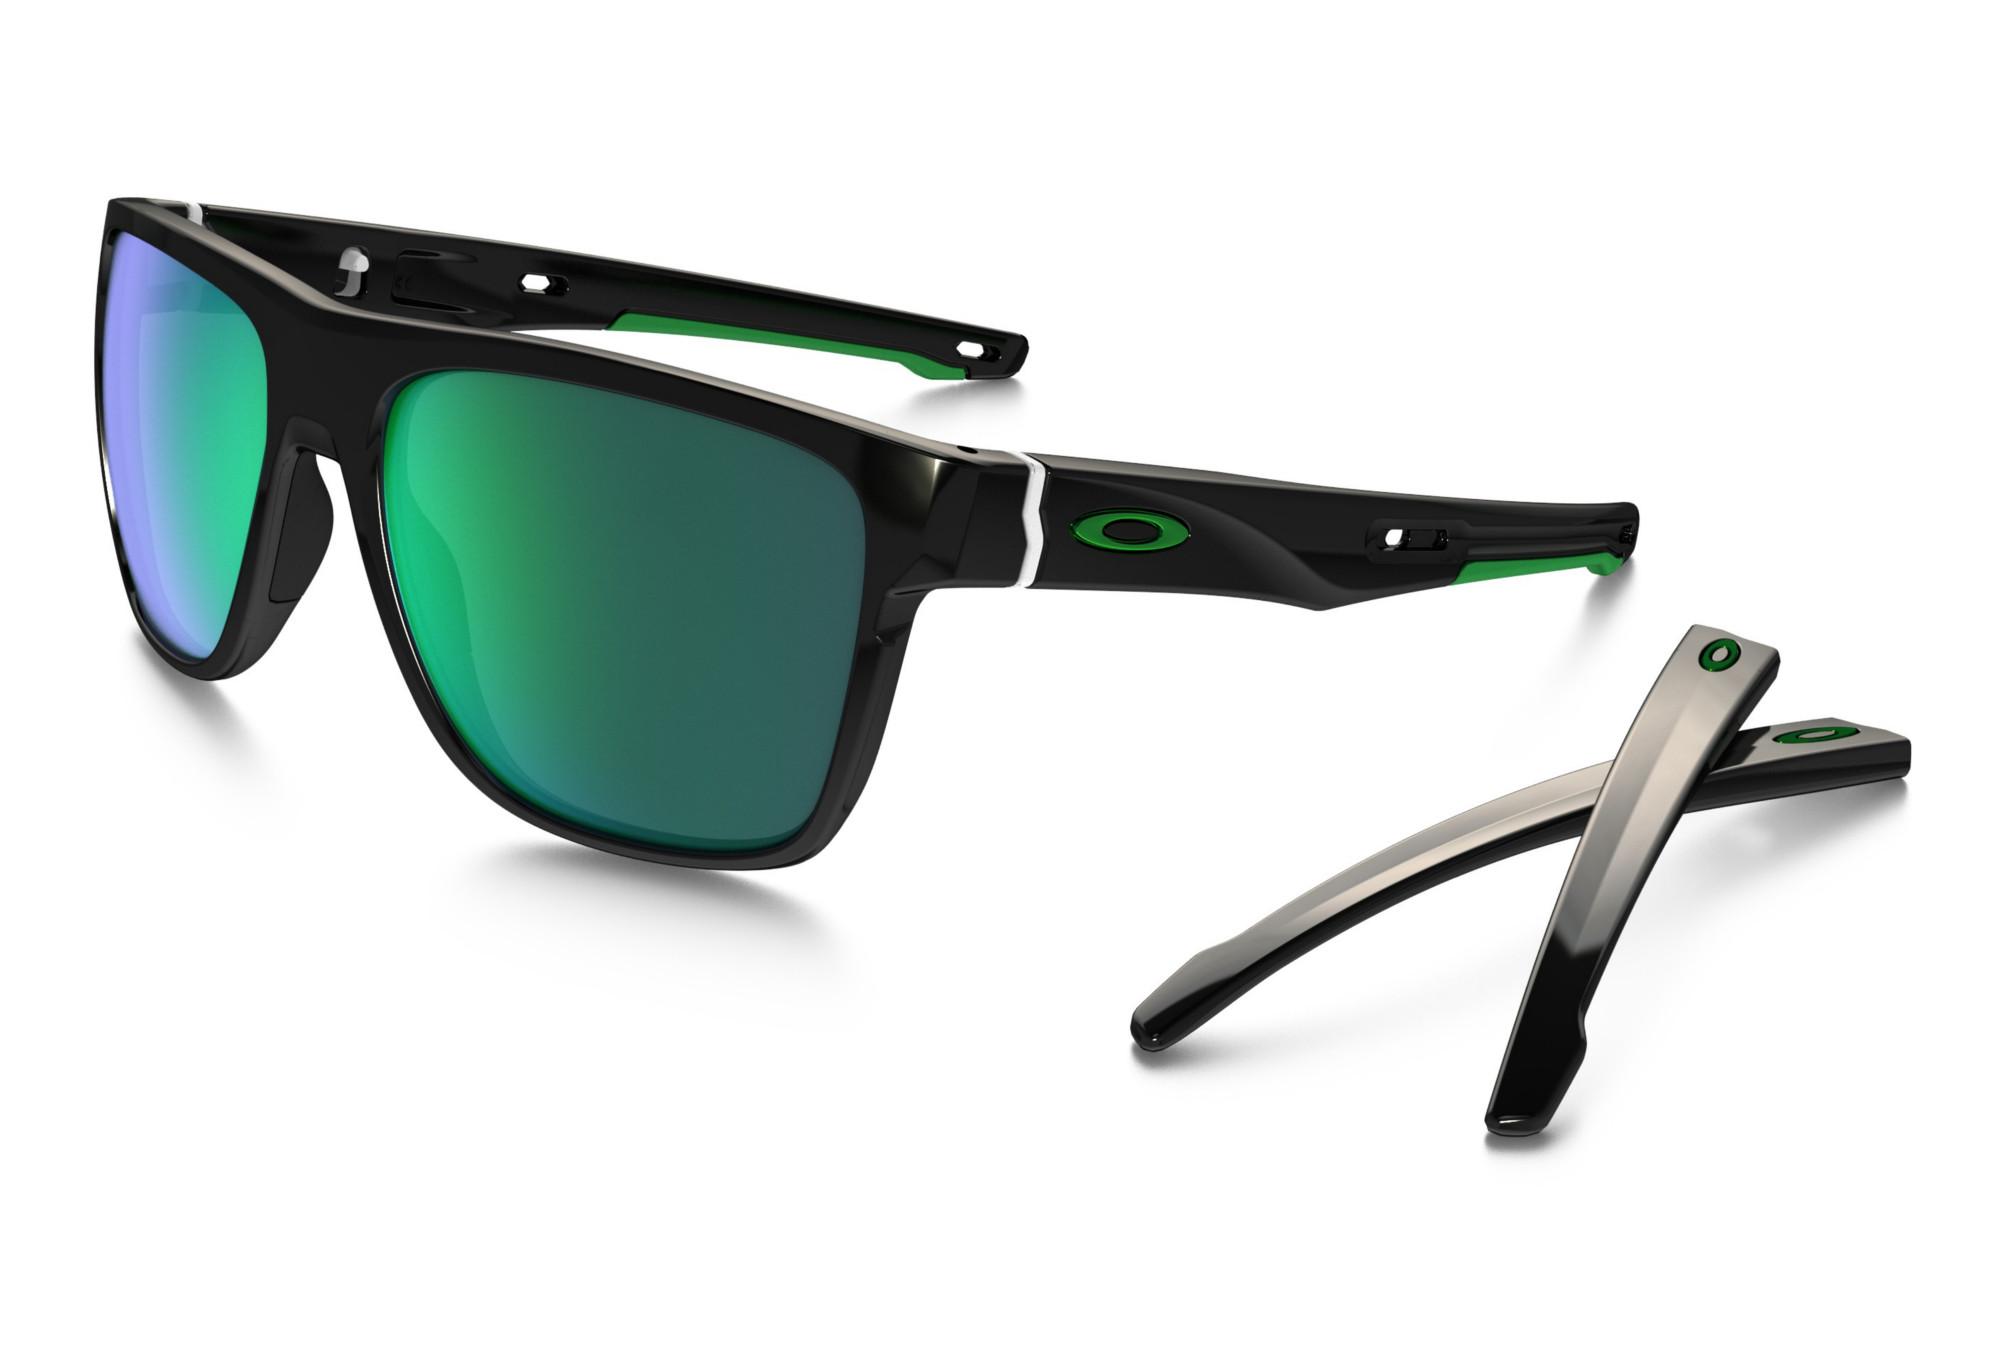 OAKLEY Sunglasses Crossrange XL Polished Black Jade Iridium Ref OO9360-0258 7e096086295a